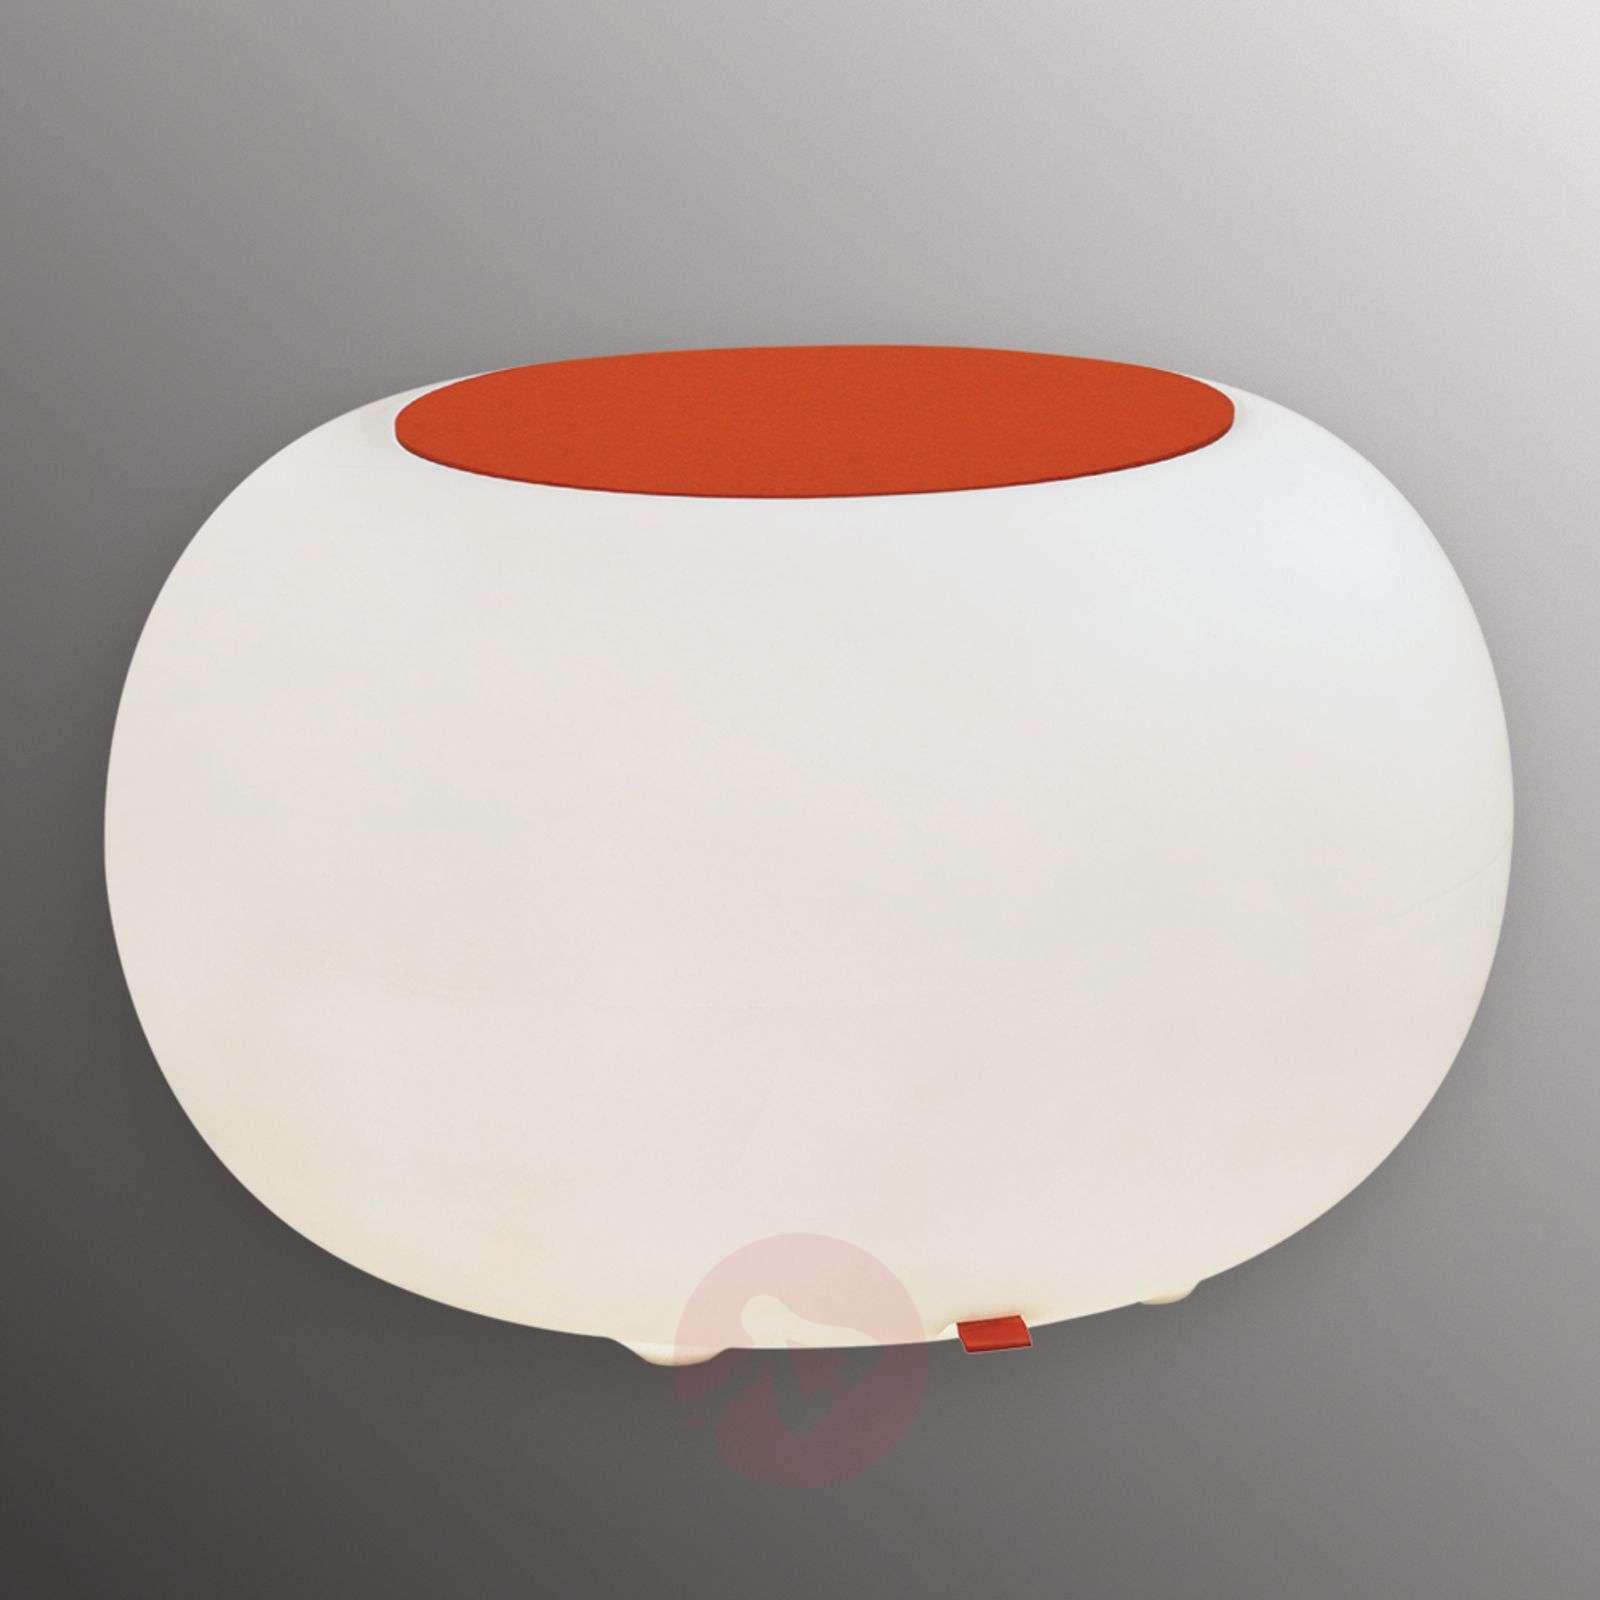 Bubble Outdoor LED pöytä LED RGB + huopa oranssi-6537070-01